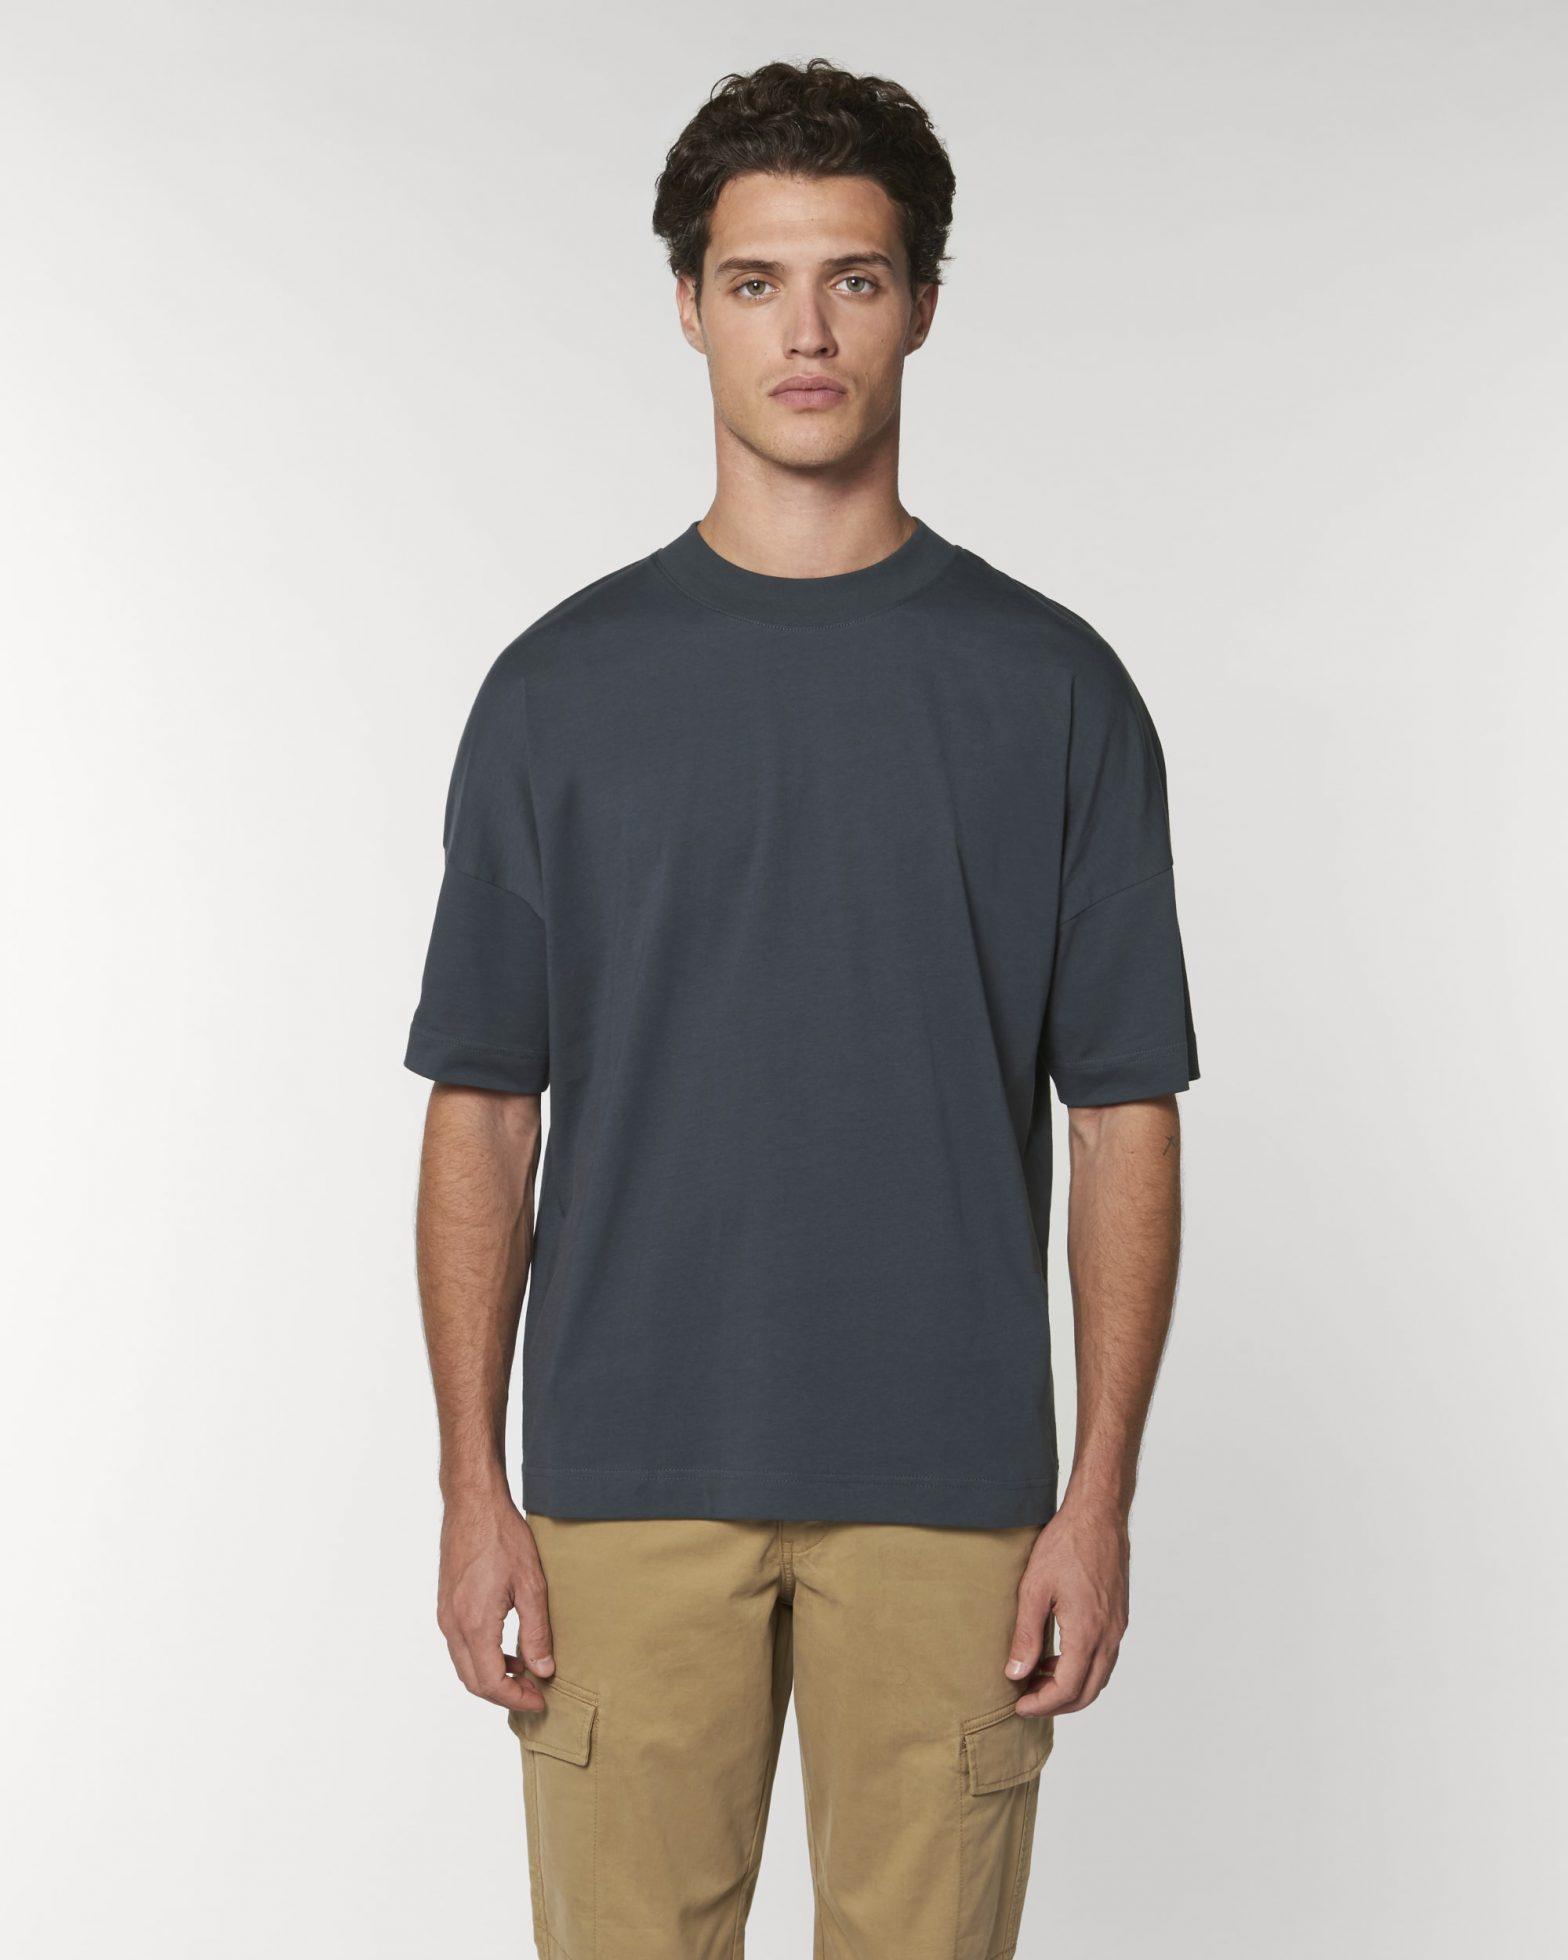 Sustainable T-shirt Grey